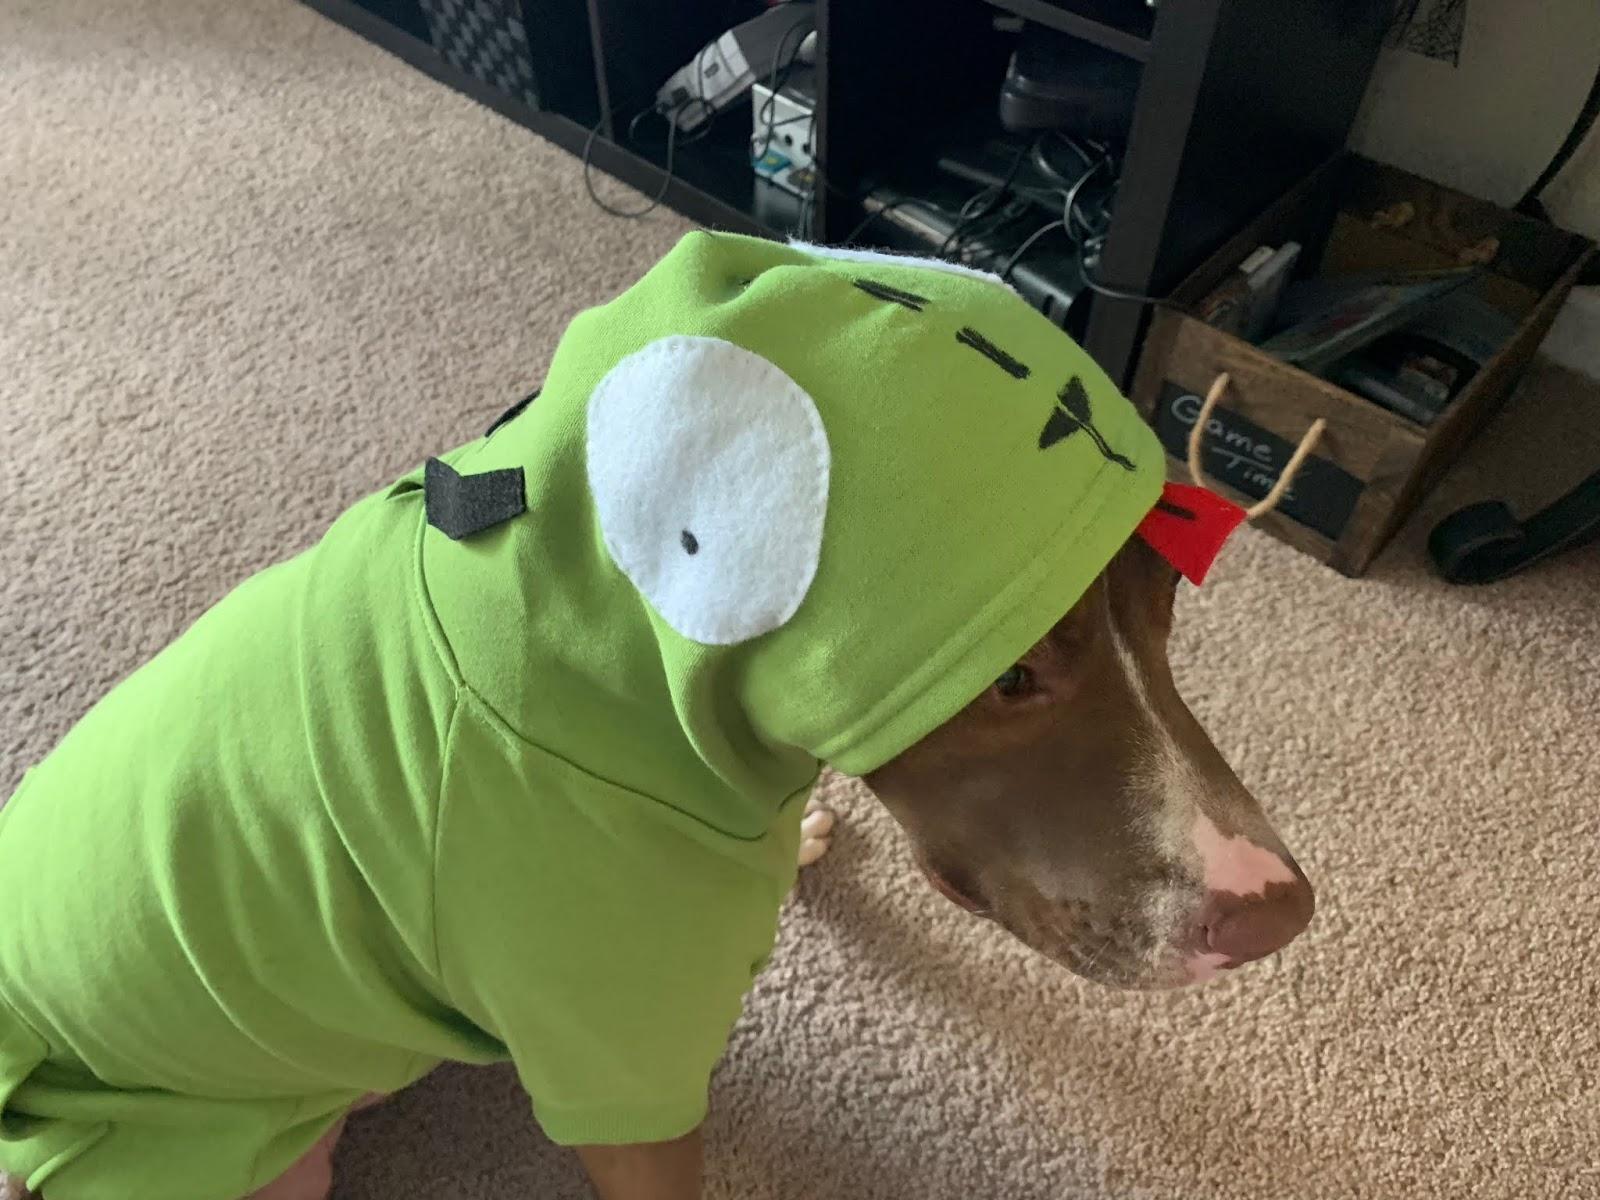 GIR the Robot Dog Costume (Invader Zim) | The Nifty Nerdarella